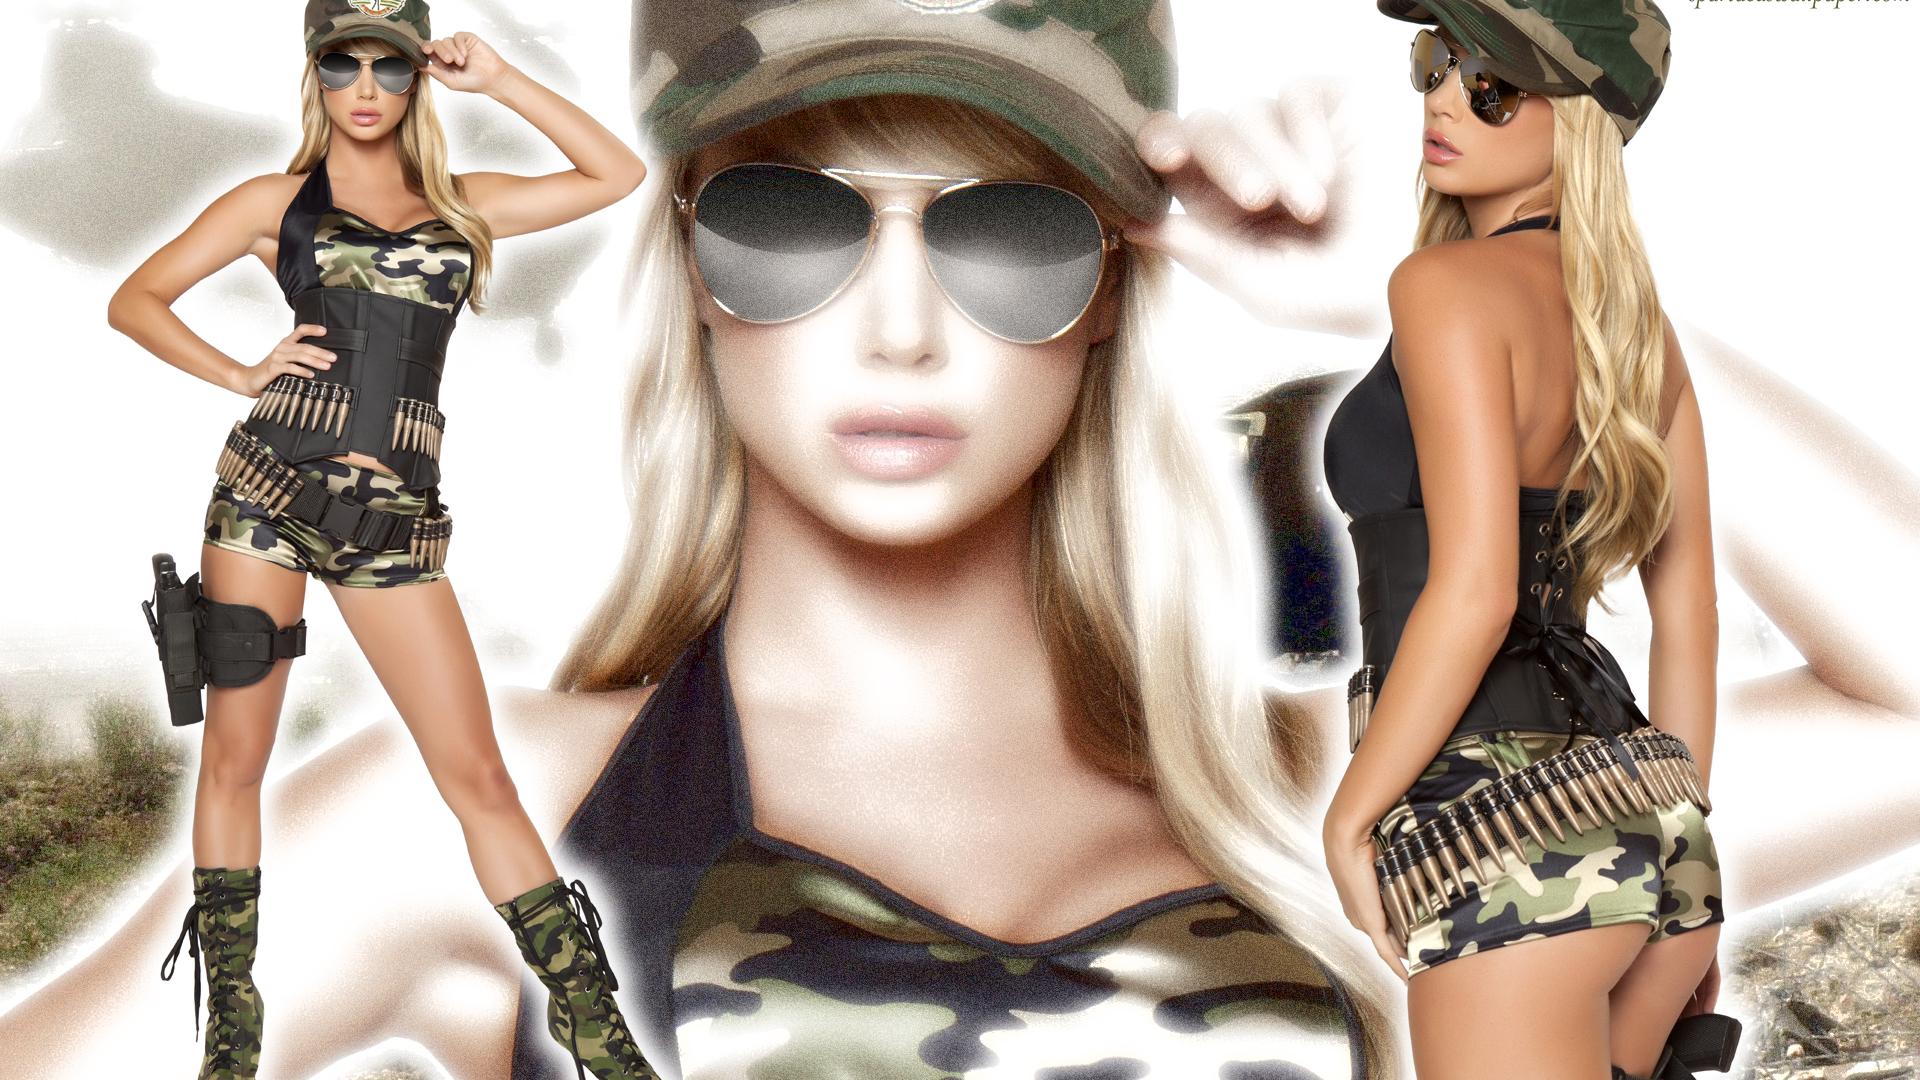 Free Download Sara Jean Underwood Il Desktop Backgrounds Mobile